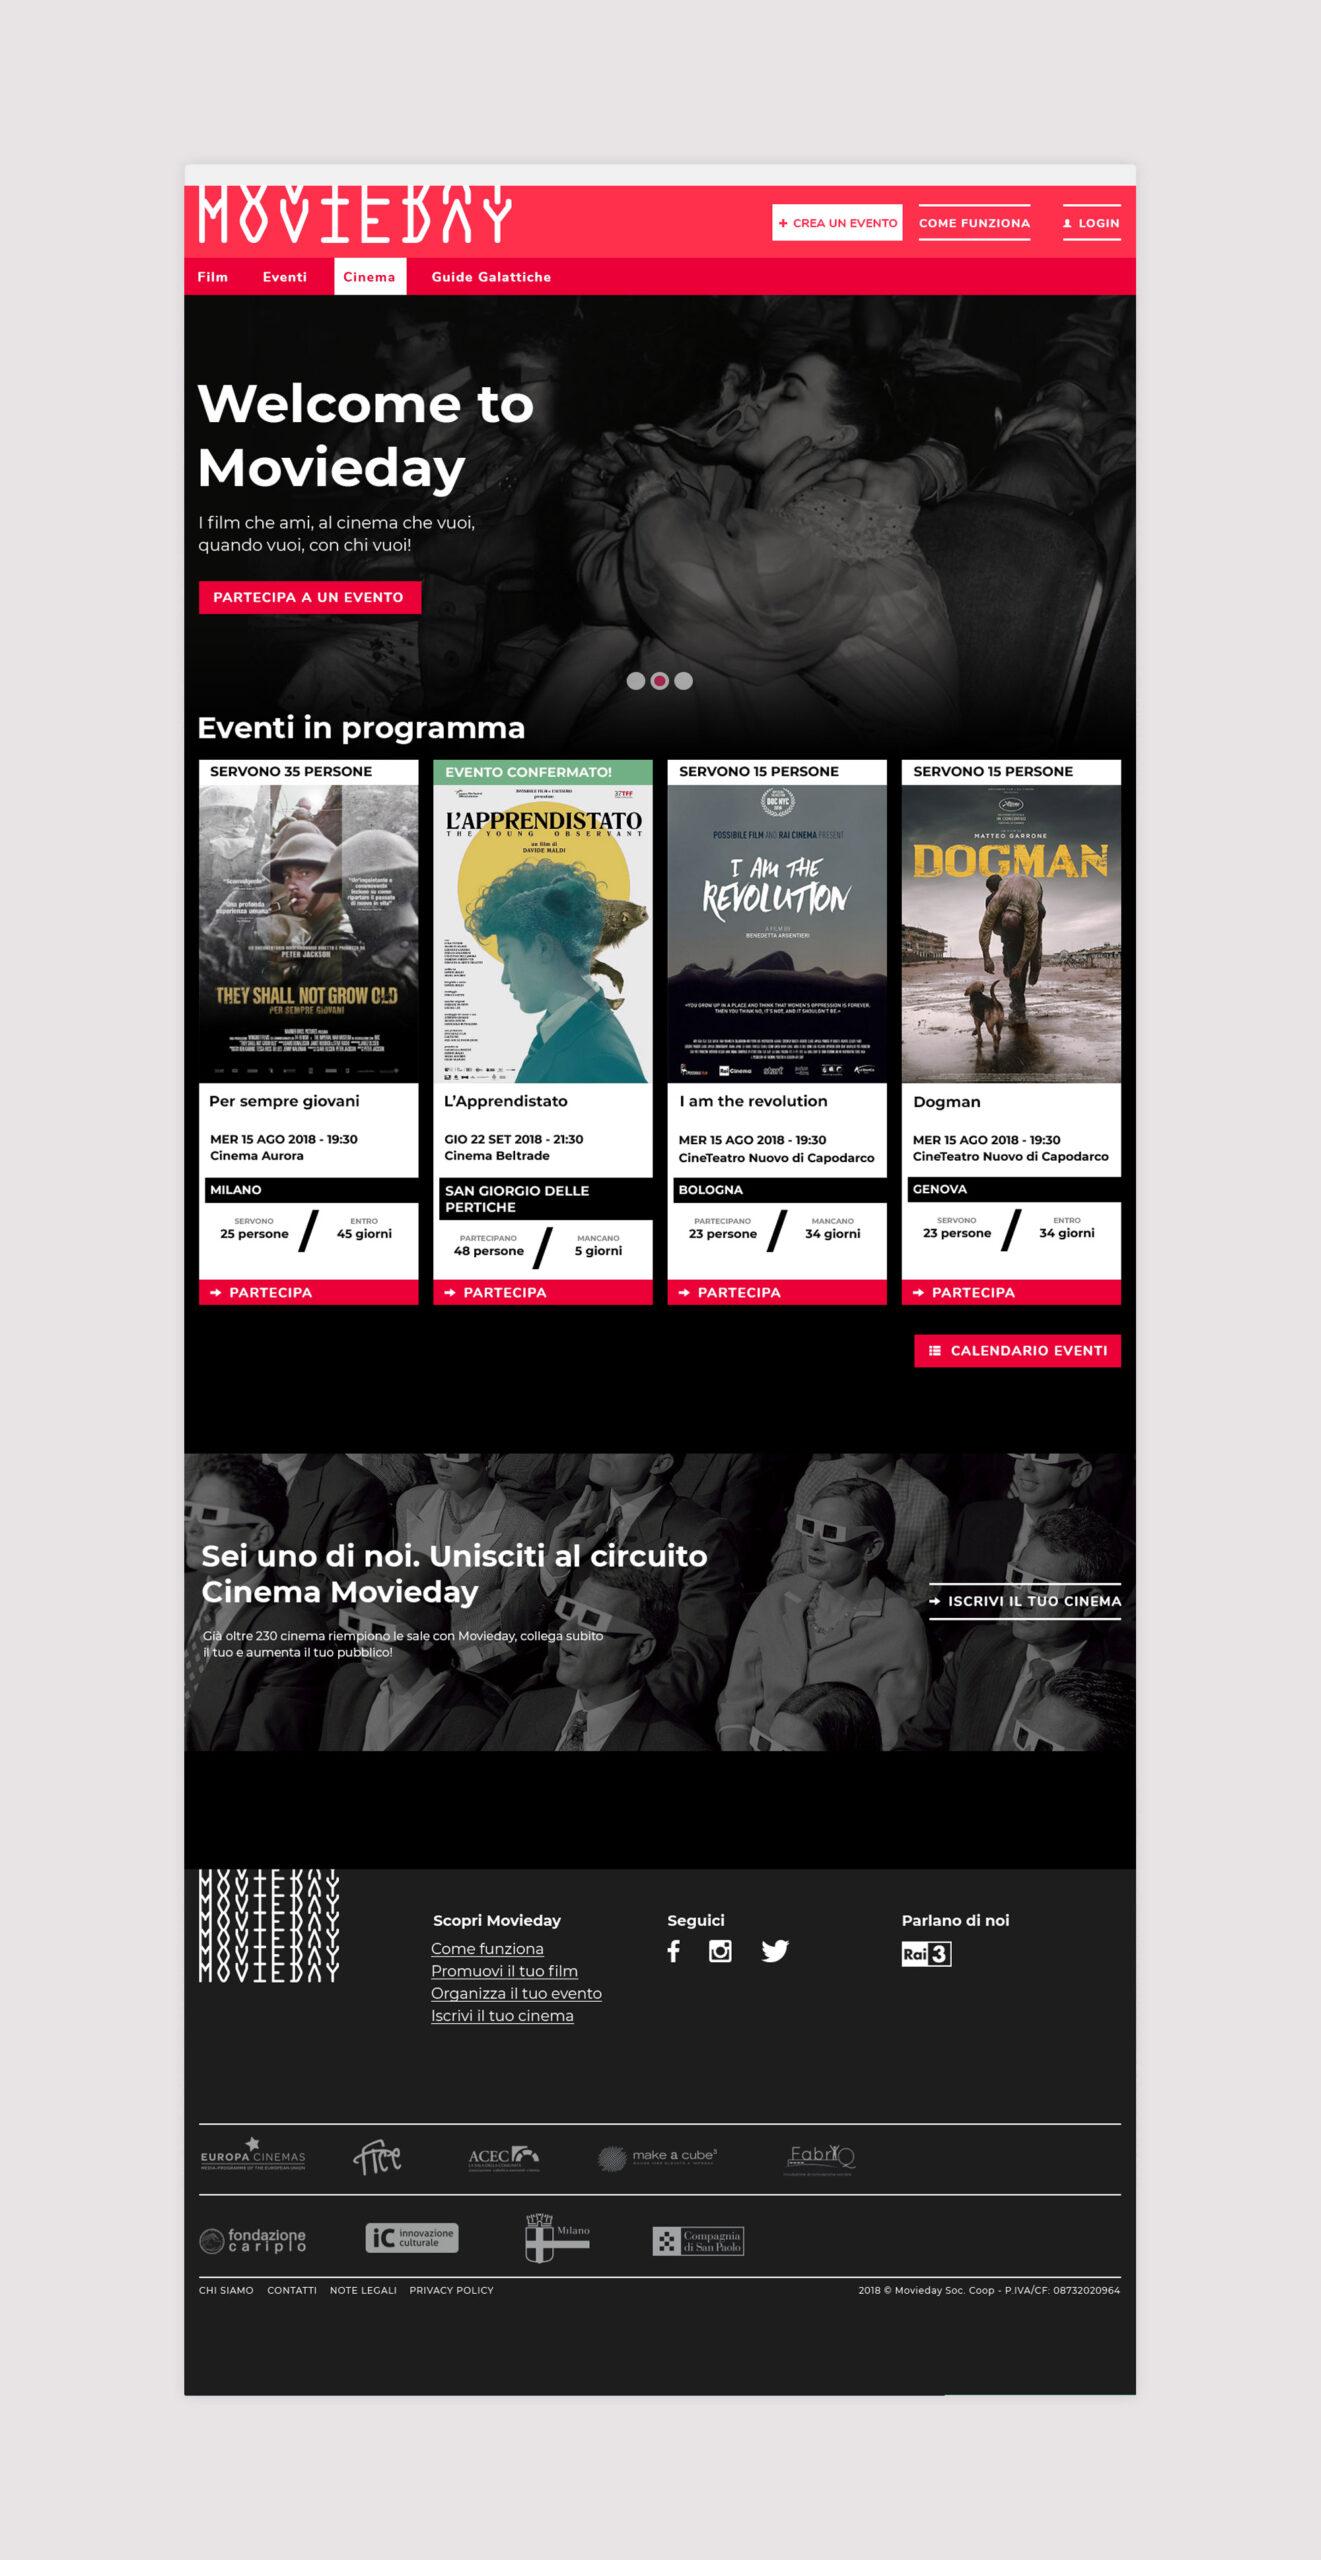 Movieday homepage